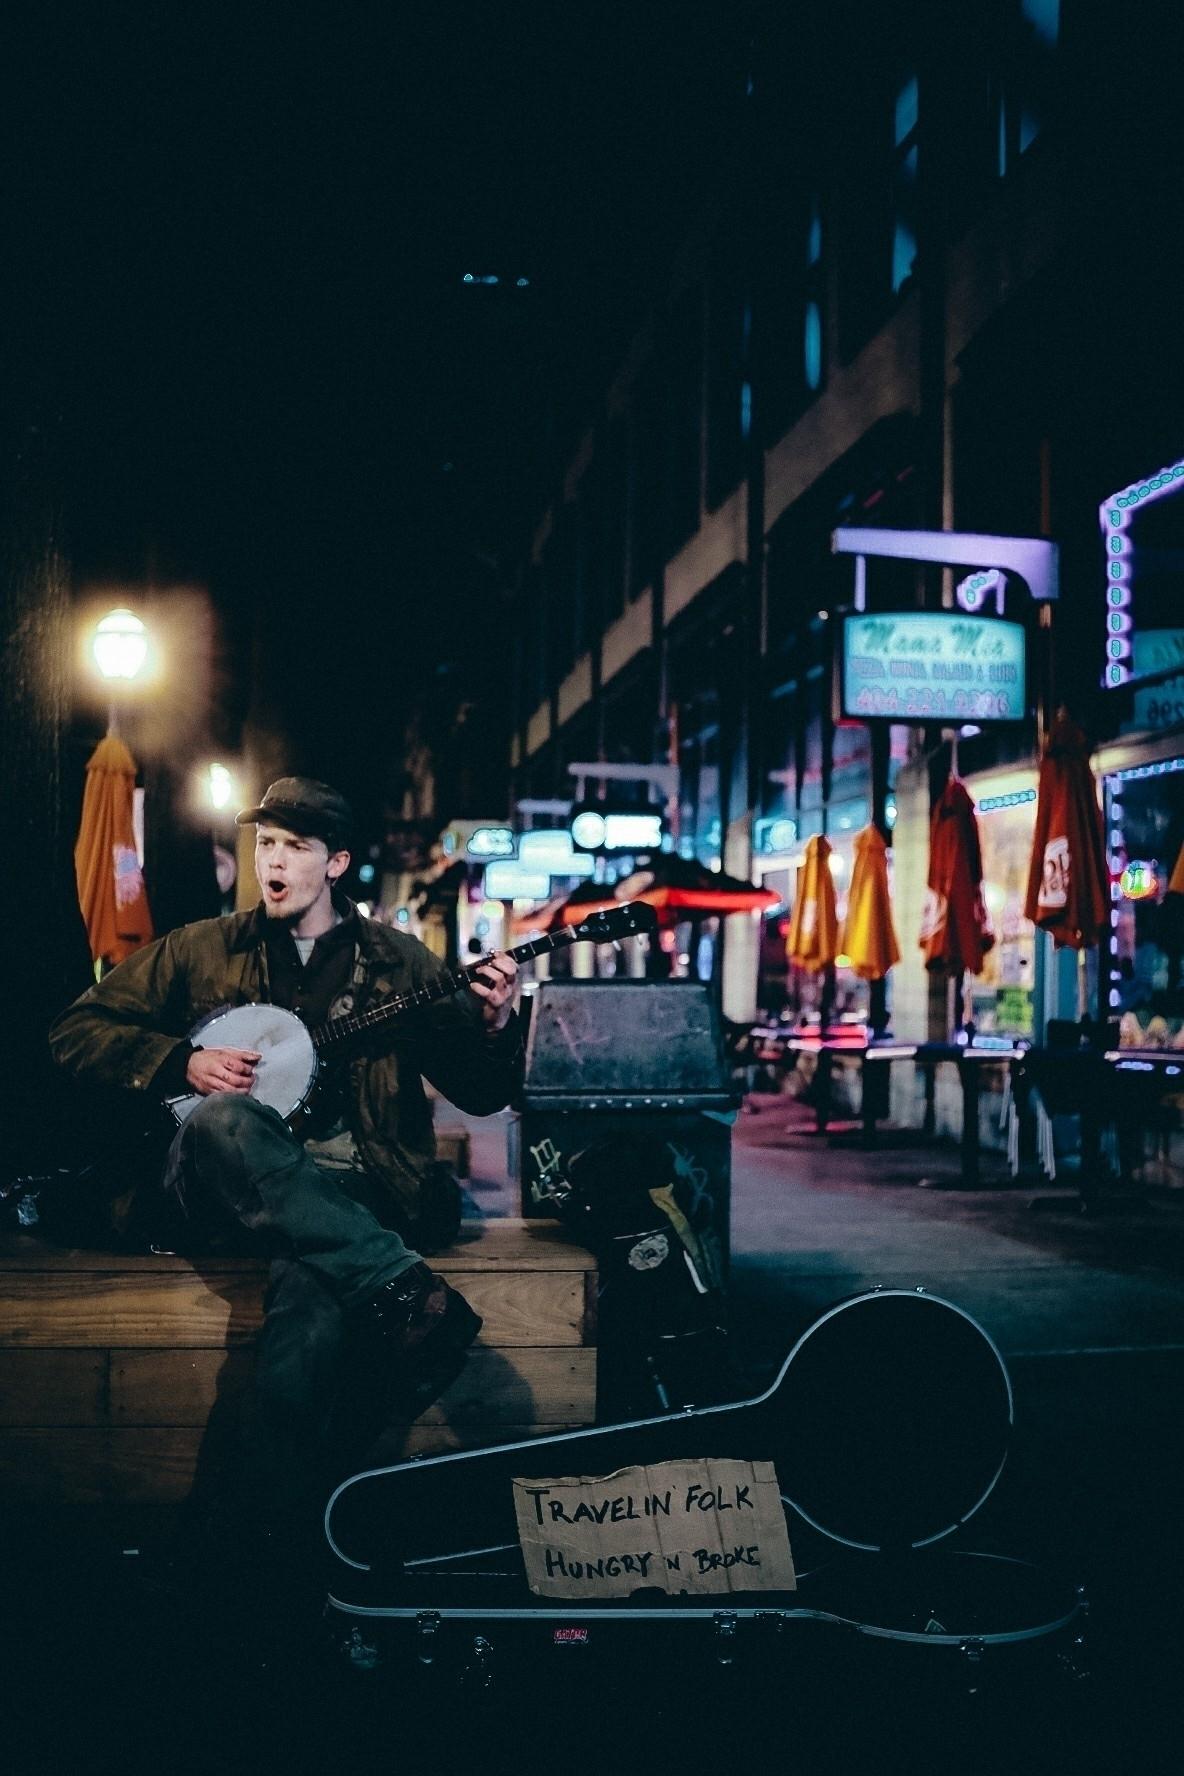 streetlife, streetphotography - 88shotz | ello